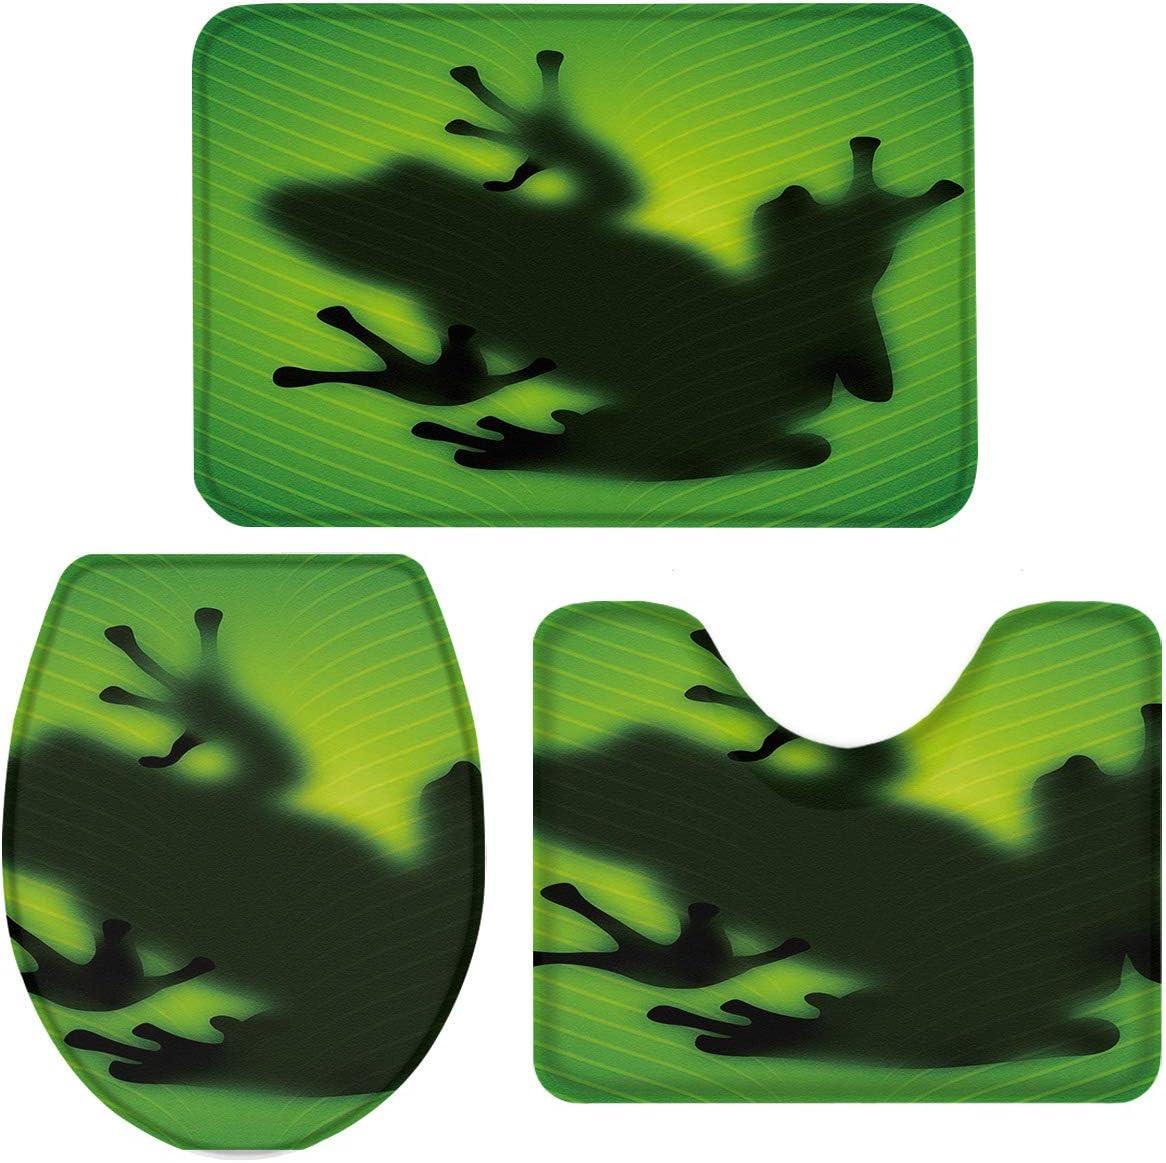 Possta Decor Frog Shadow Leaf Silhouette Bath Mat 3 Piece Set Non-Slip Bathroom Rugs Absorbent Floor Doormats Soft U-Shaped Toilet Lid Cover Contour Rug